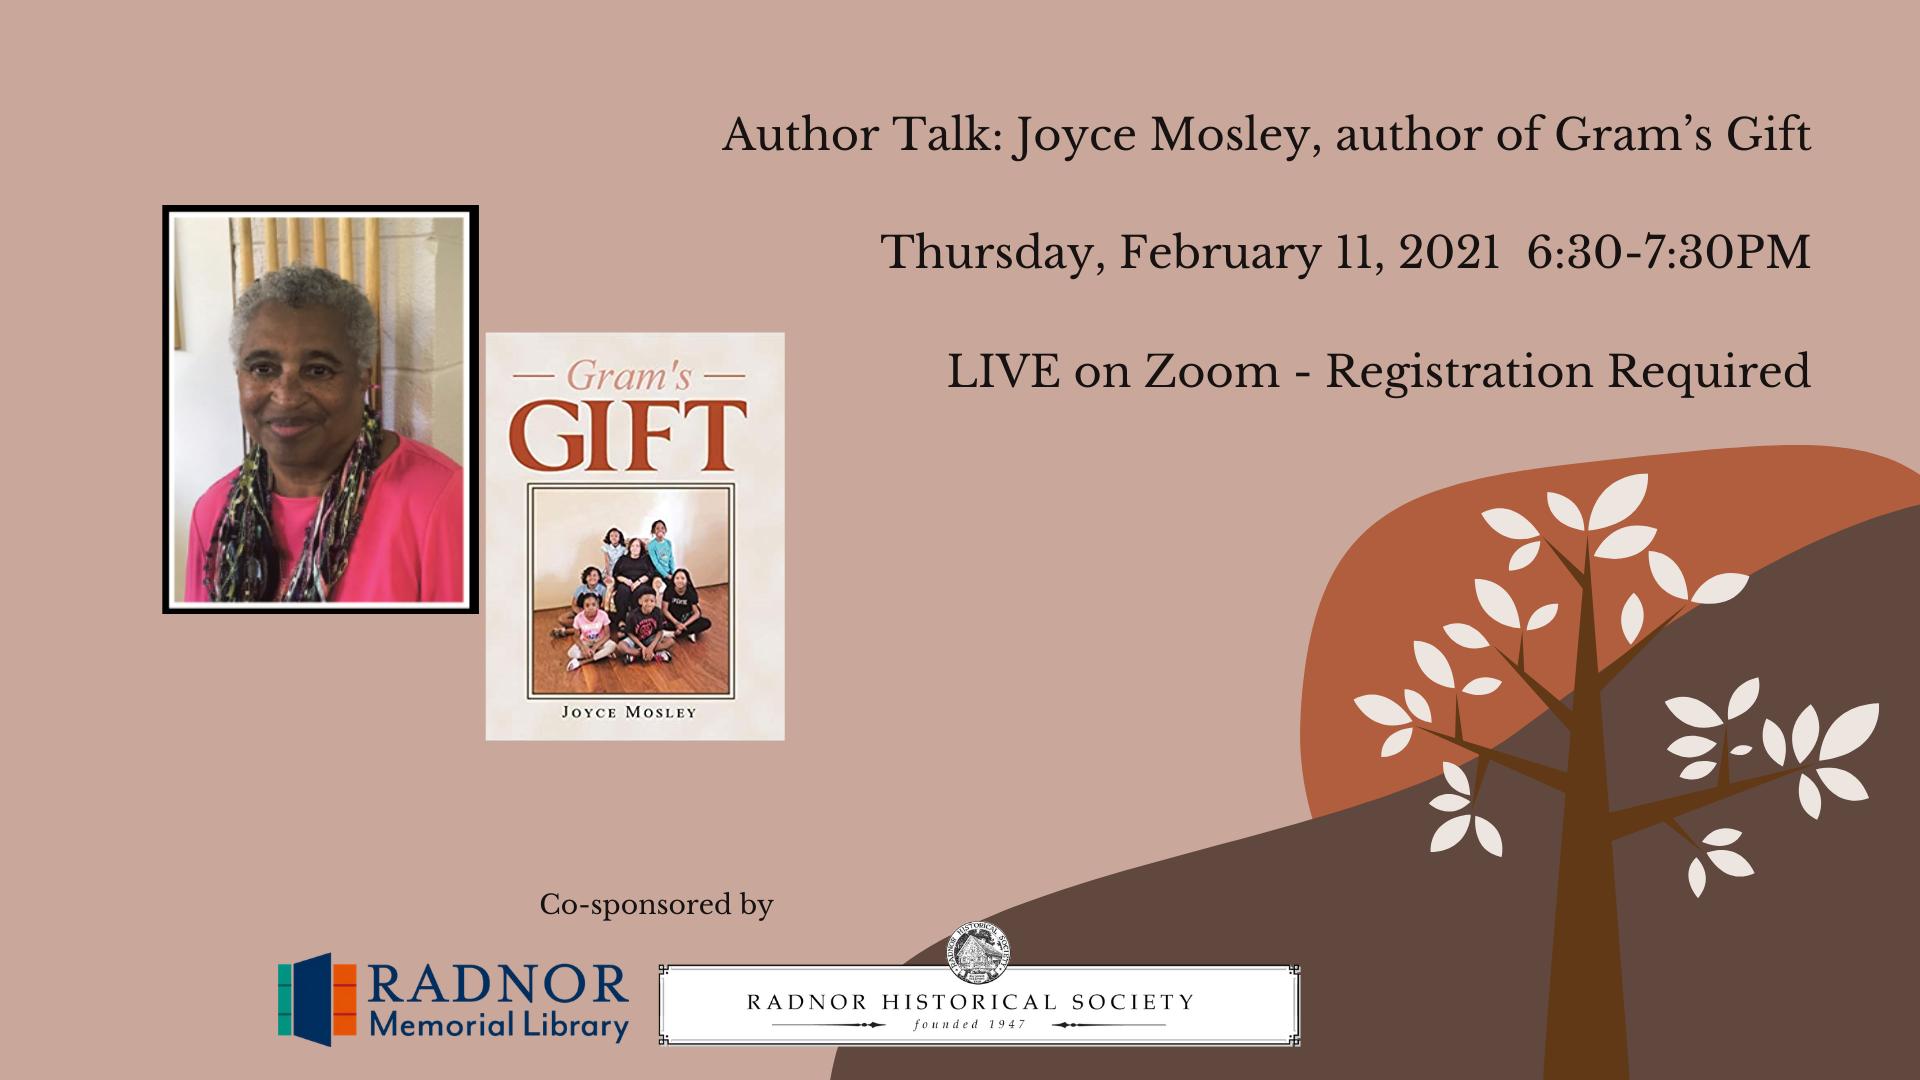 Author Talk: Joyce Mosley, author of Gram's Gift